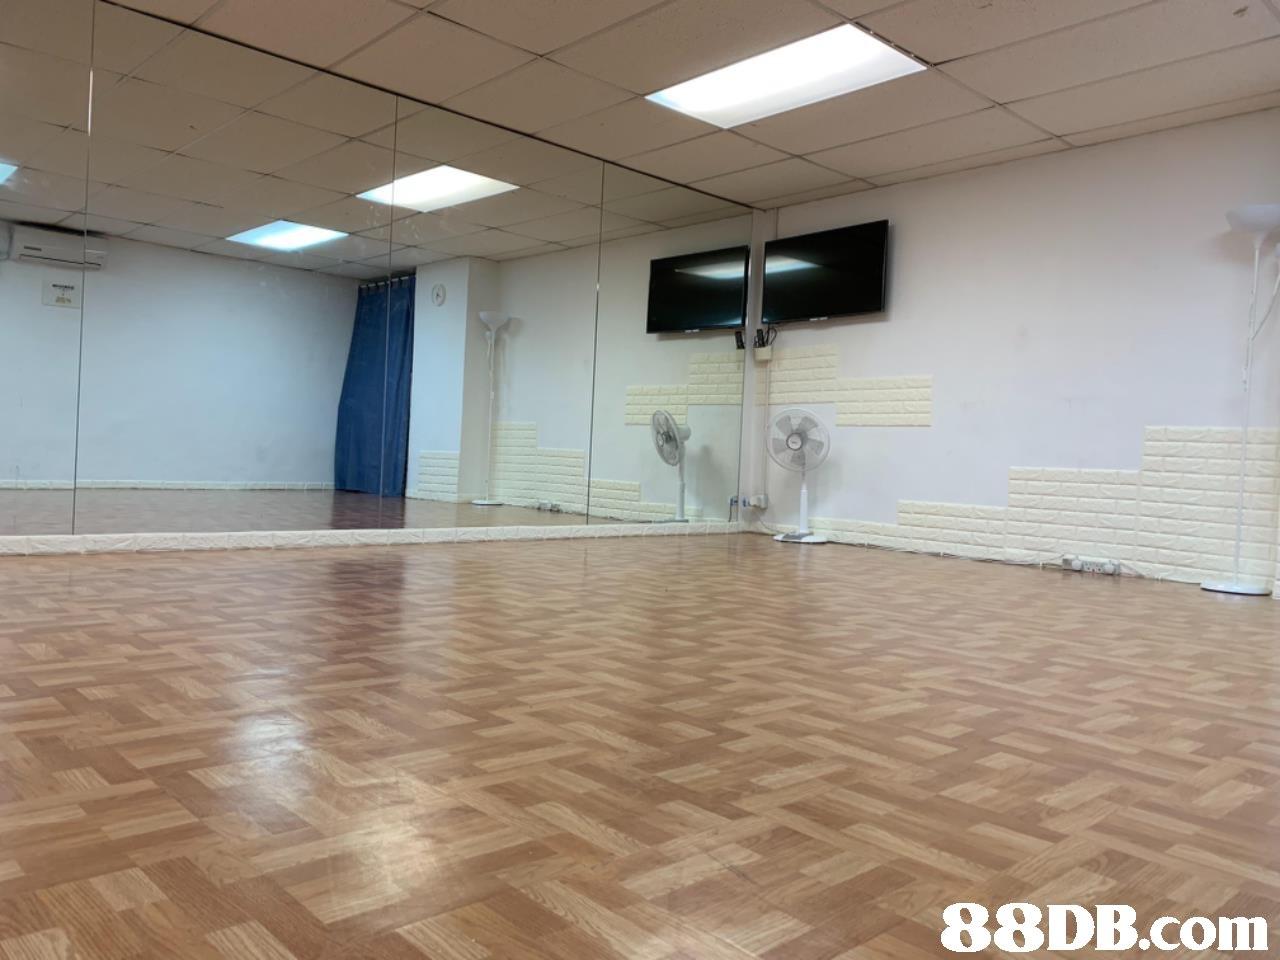 property,floor,flooring,room,hardwood